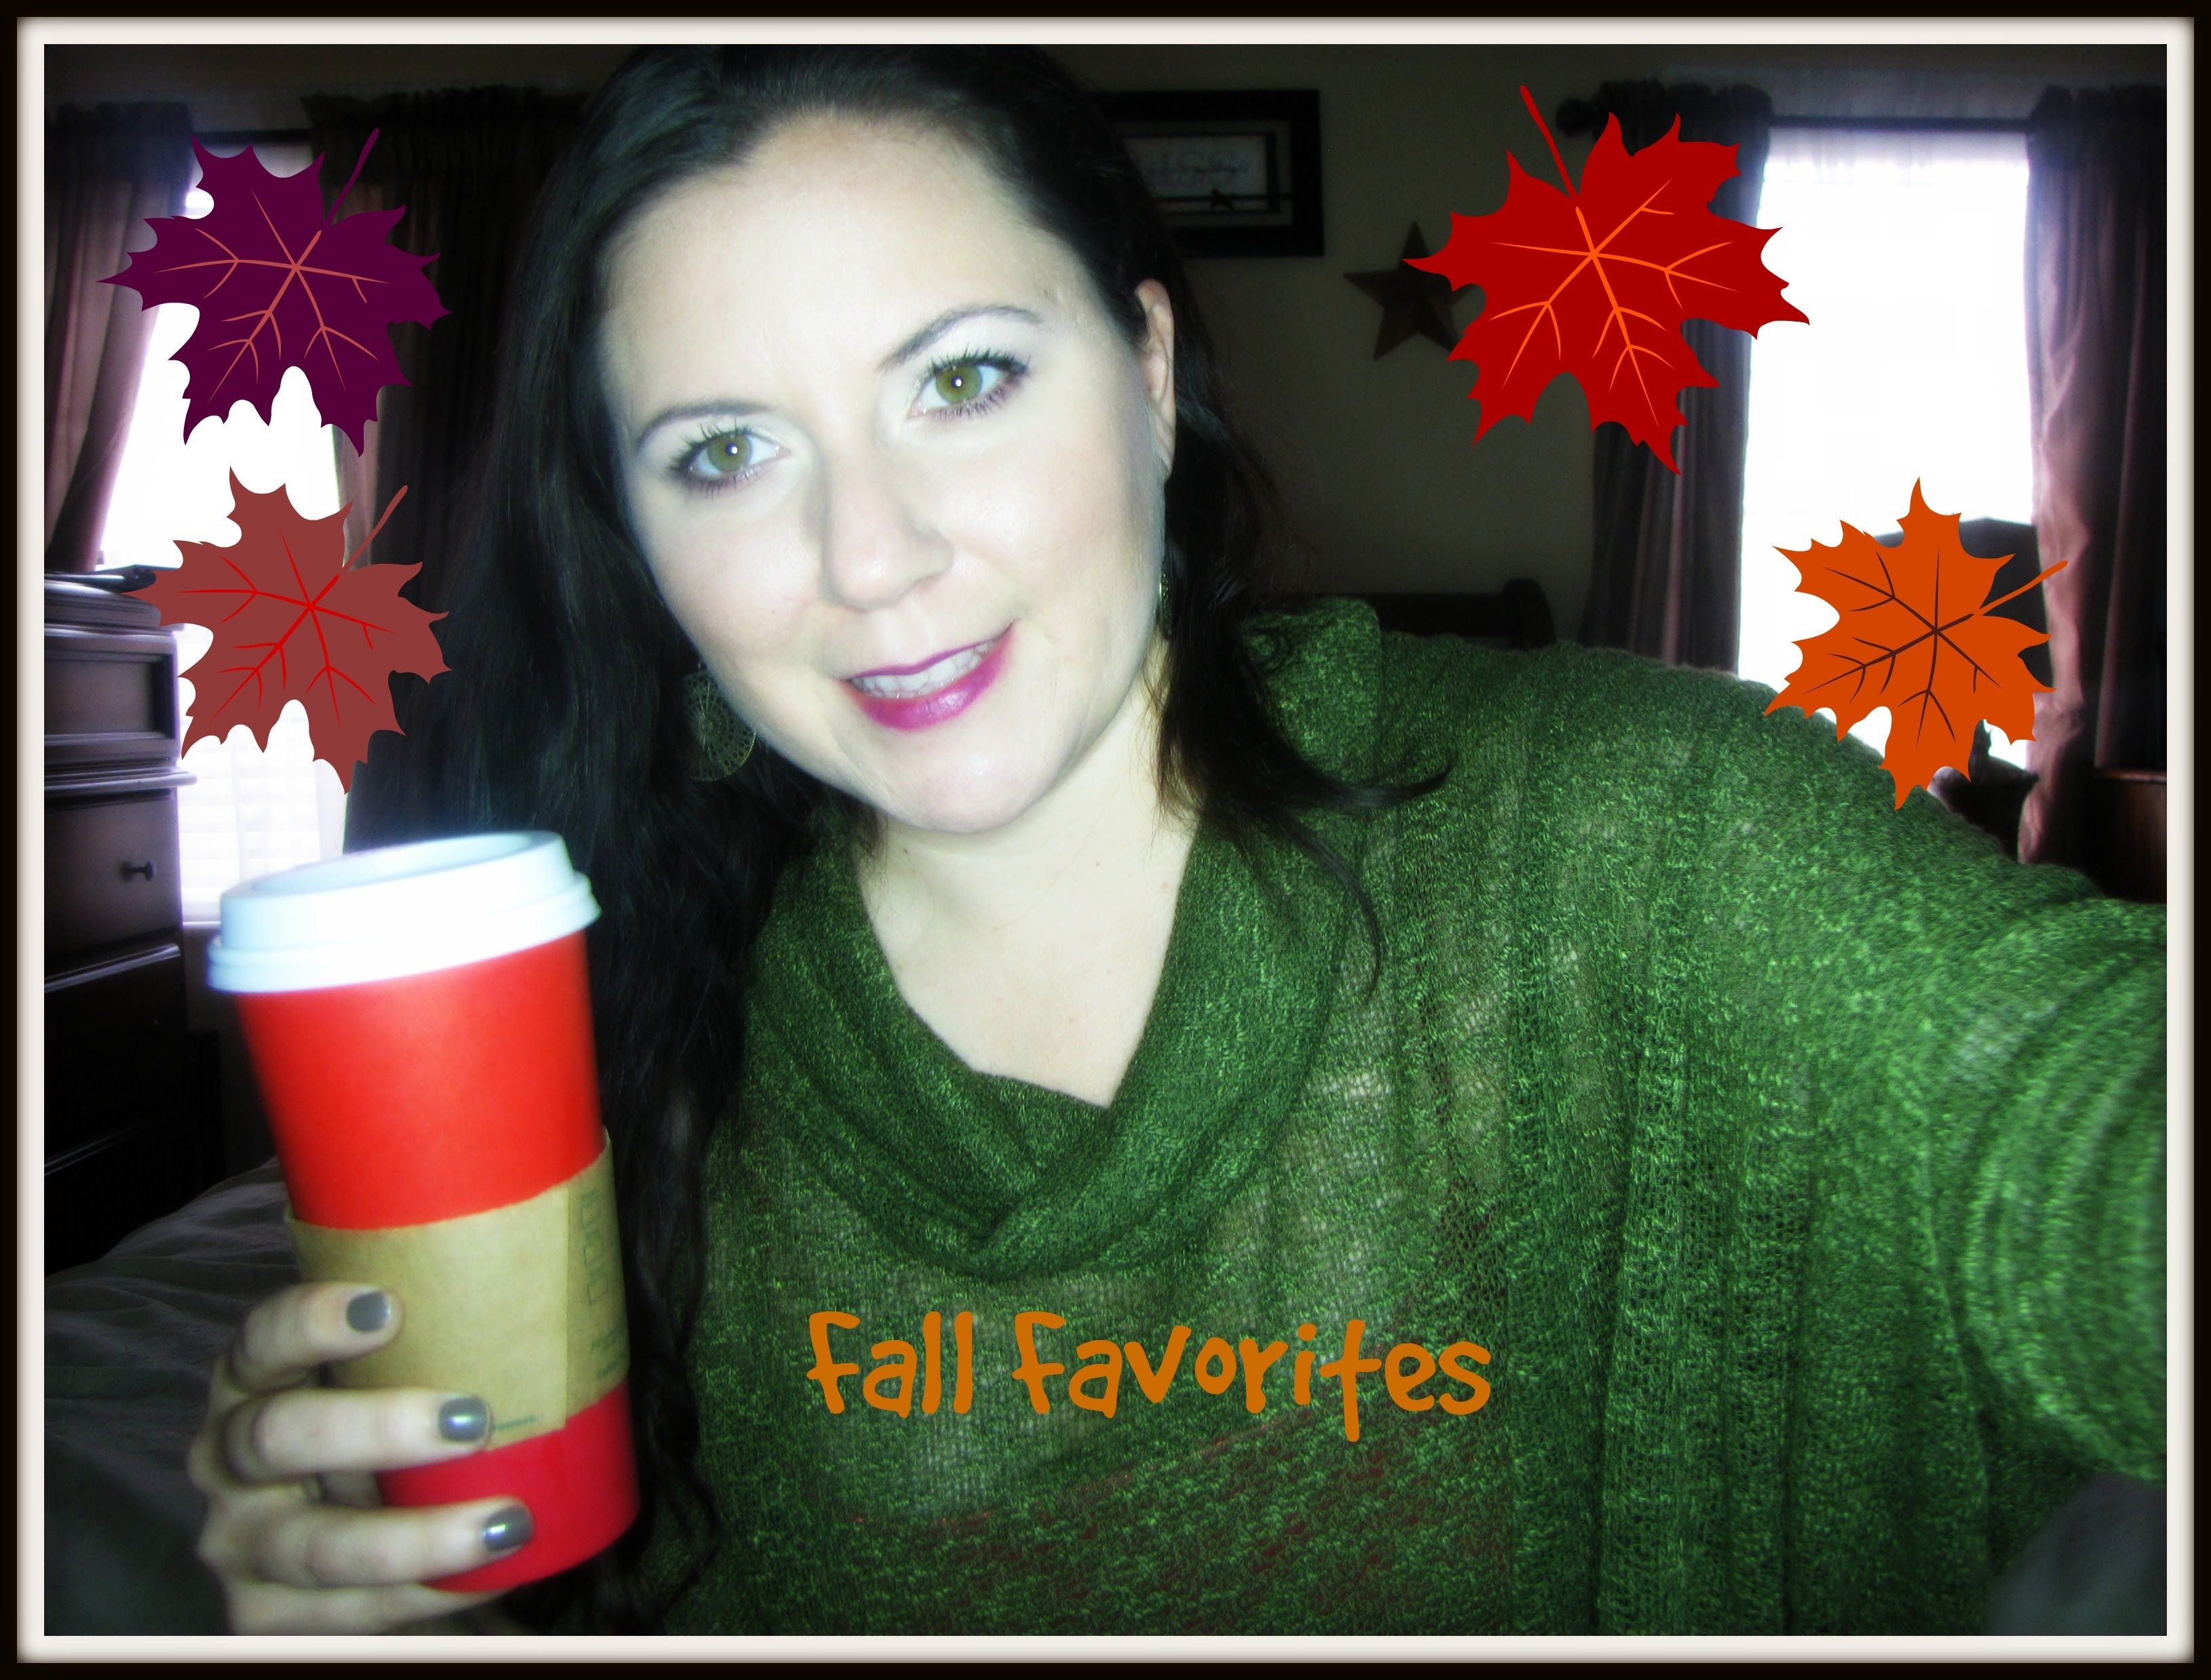 Fall Favorites Tag